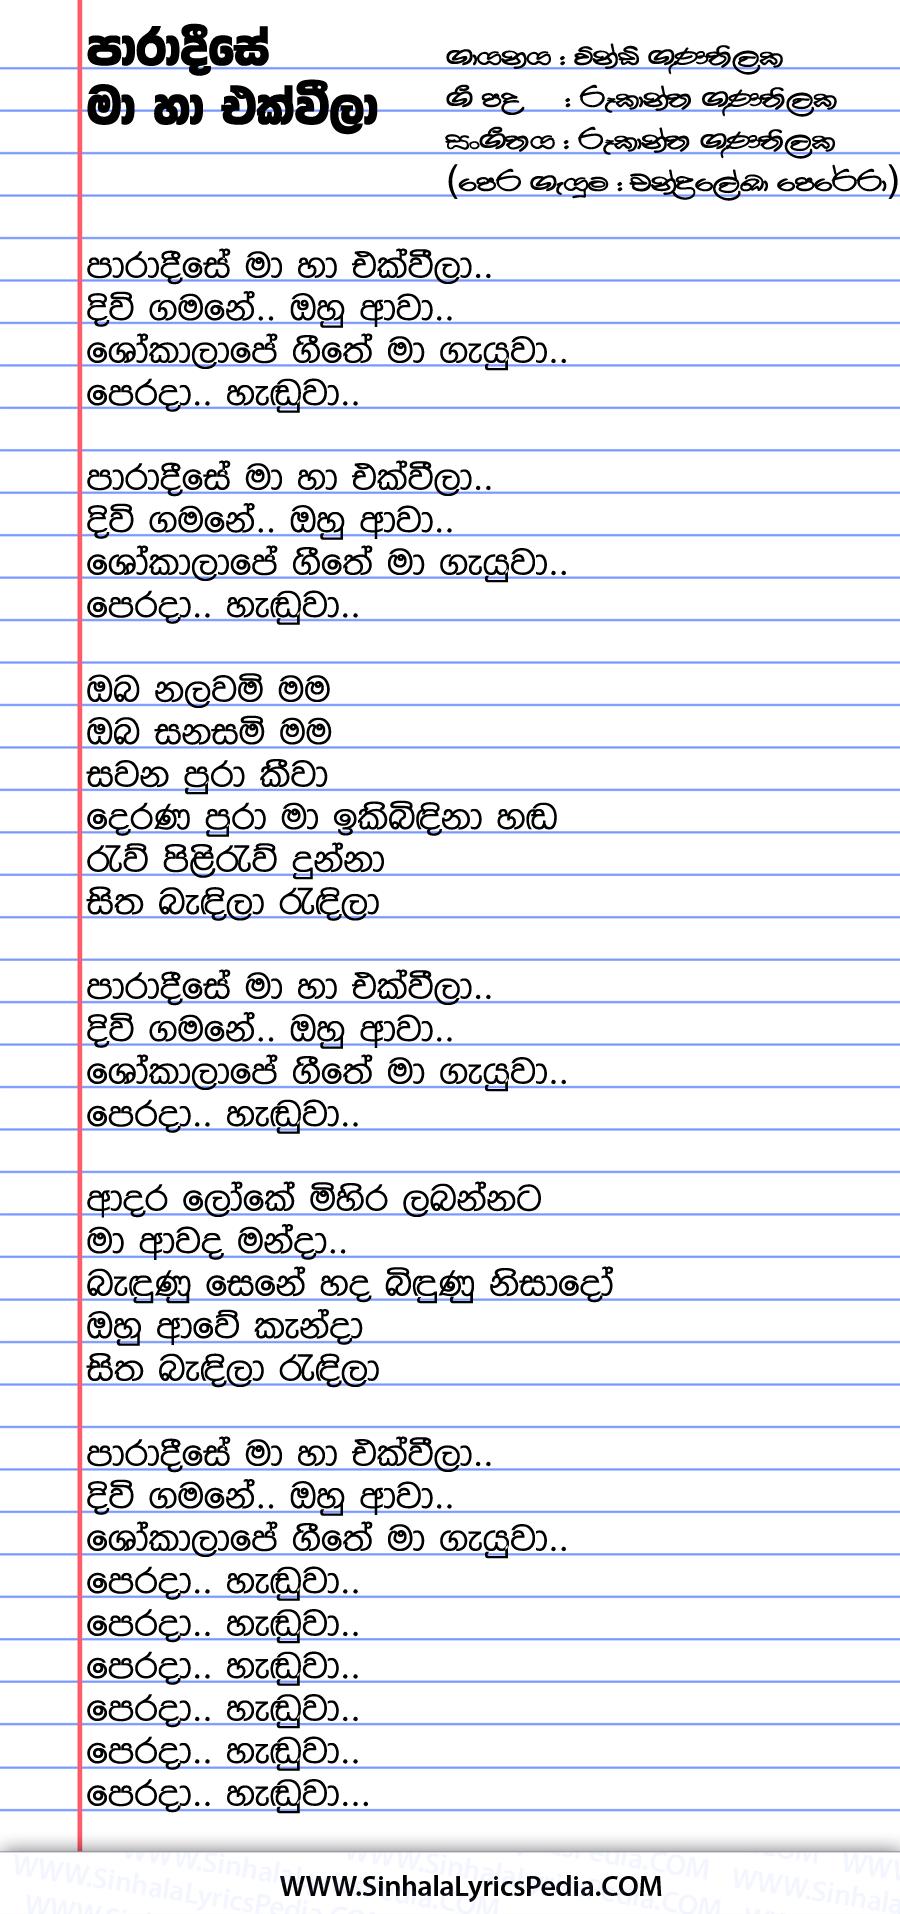 Paradeese Ma Ha Ek Weela Song Lyrics